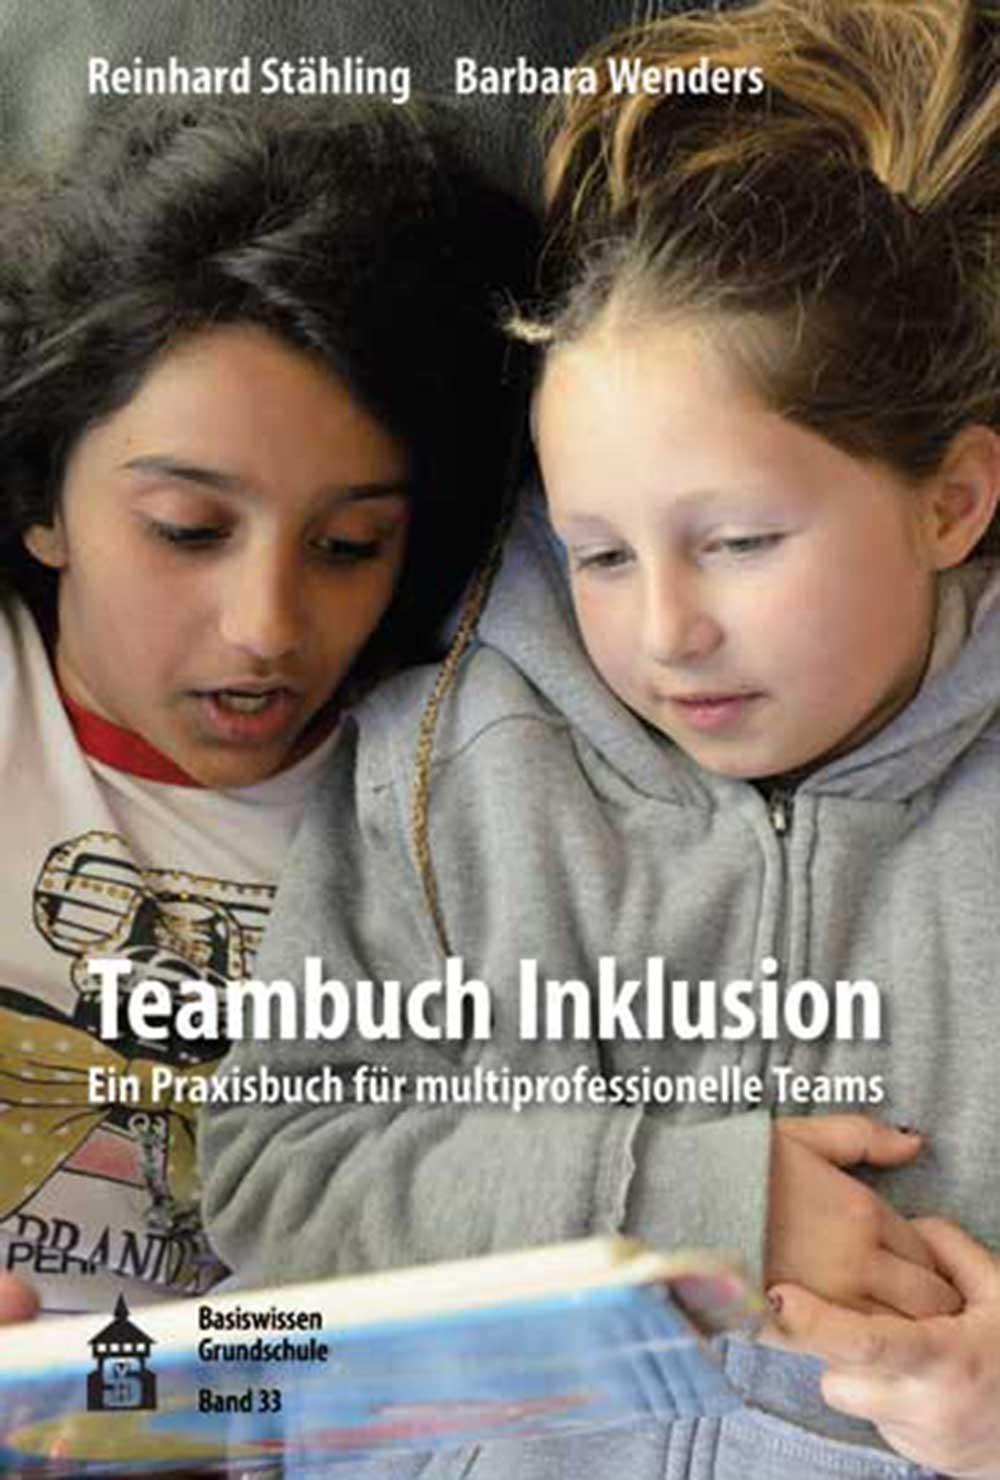 Teambuch Inklusion | Reinhard Stähling |  9783834015310